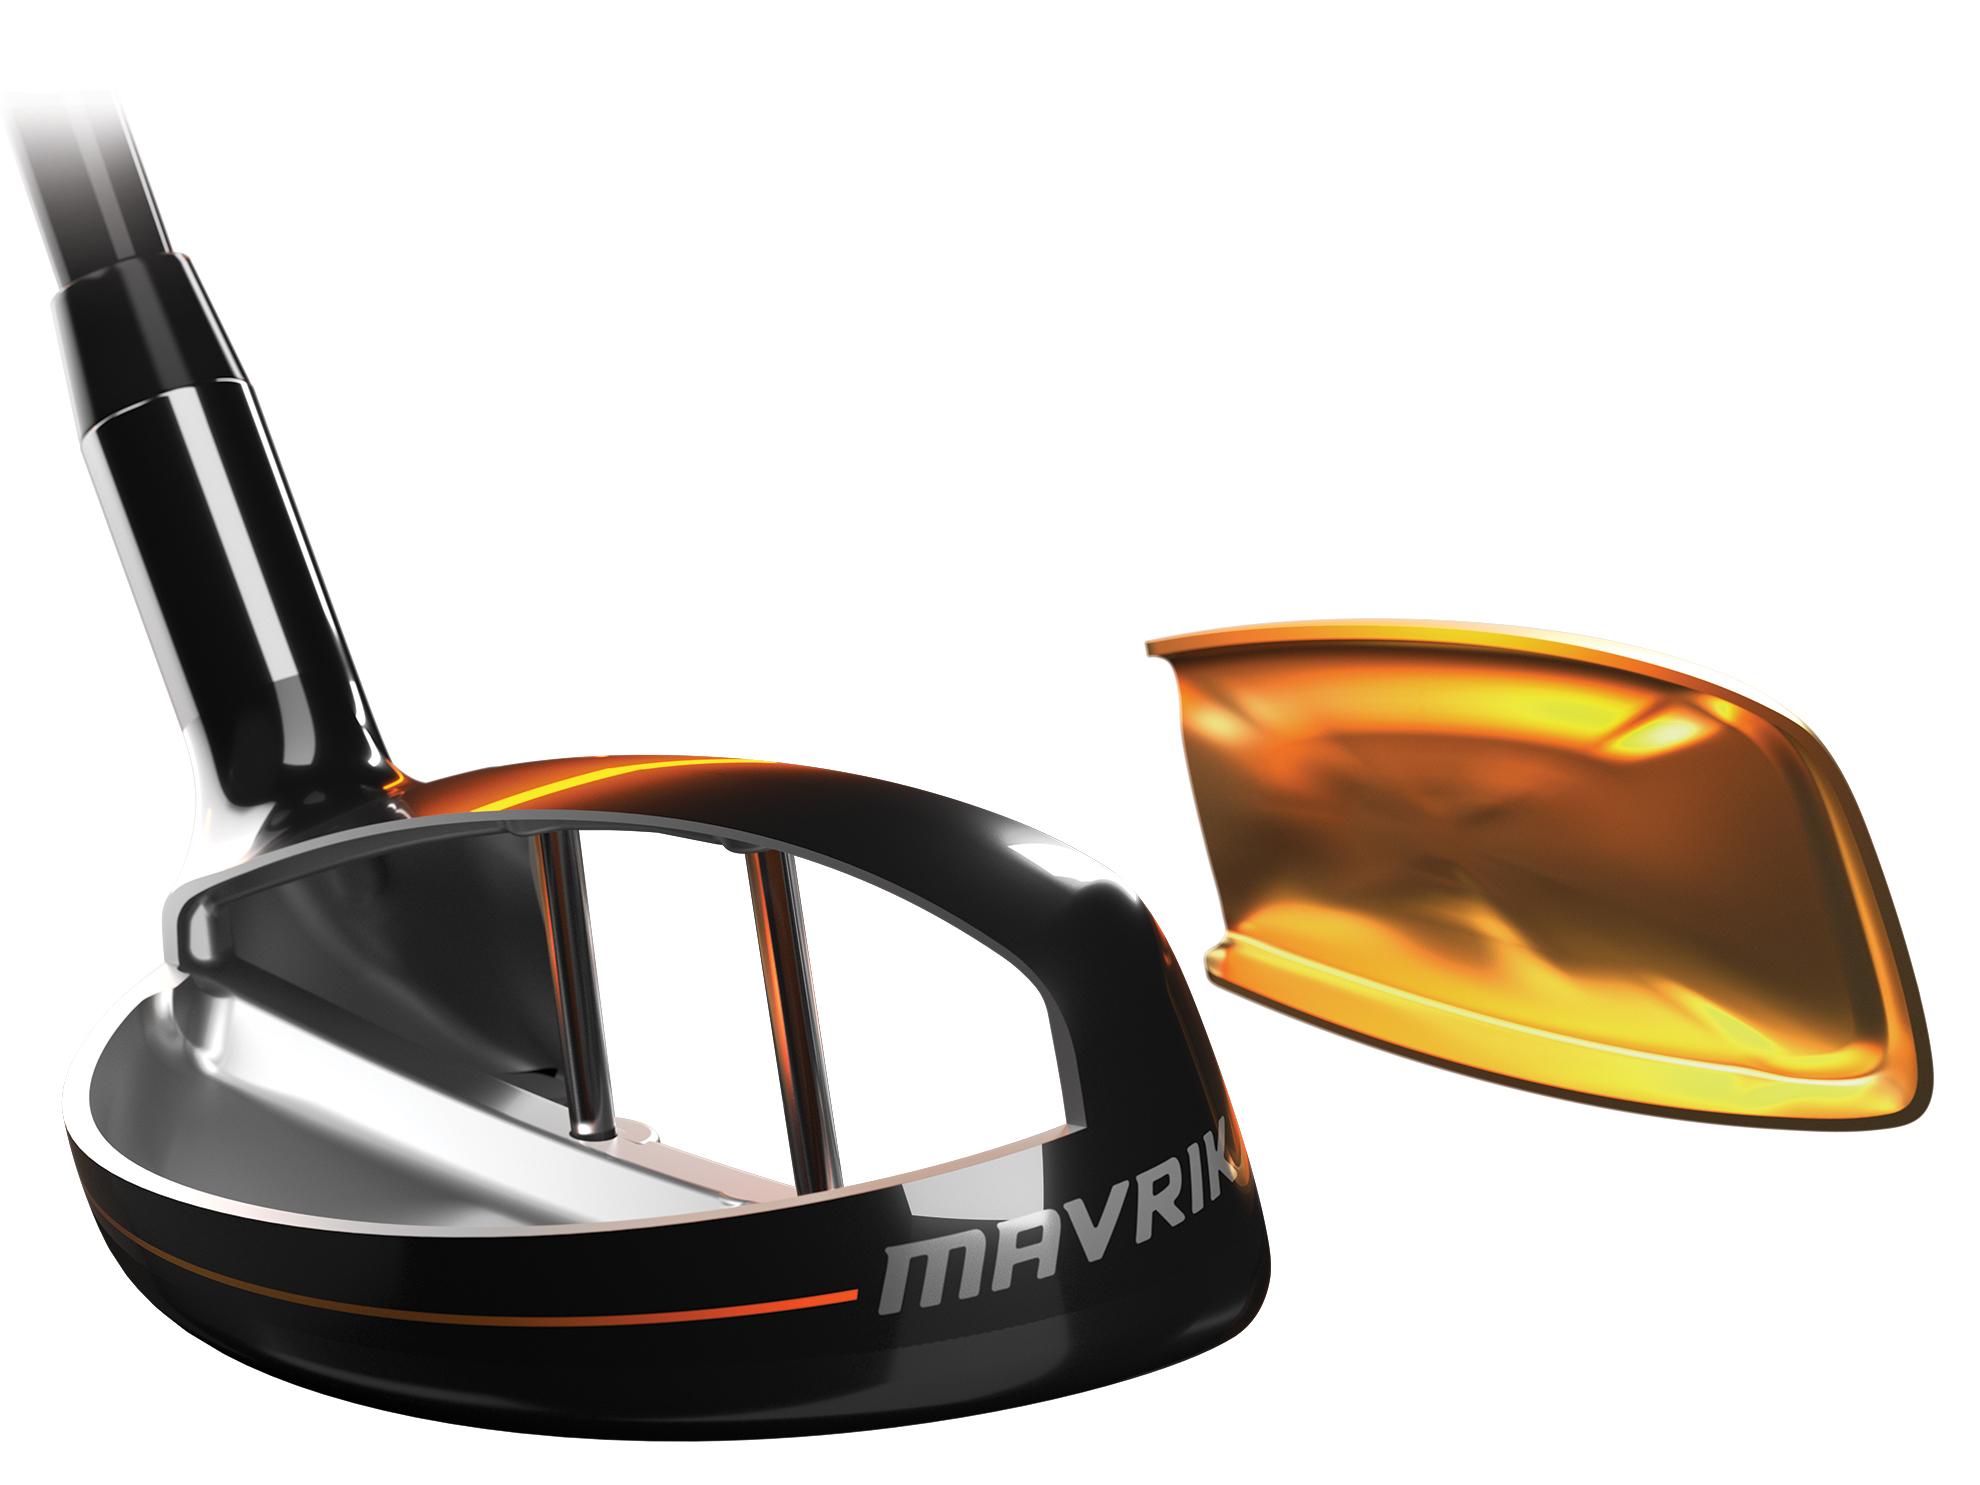 hybrids-2020-mavrik-std-main-tech